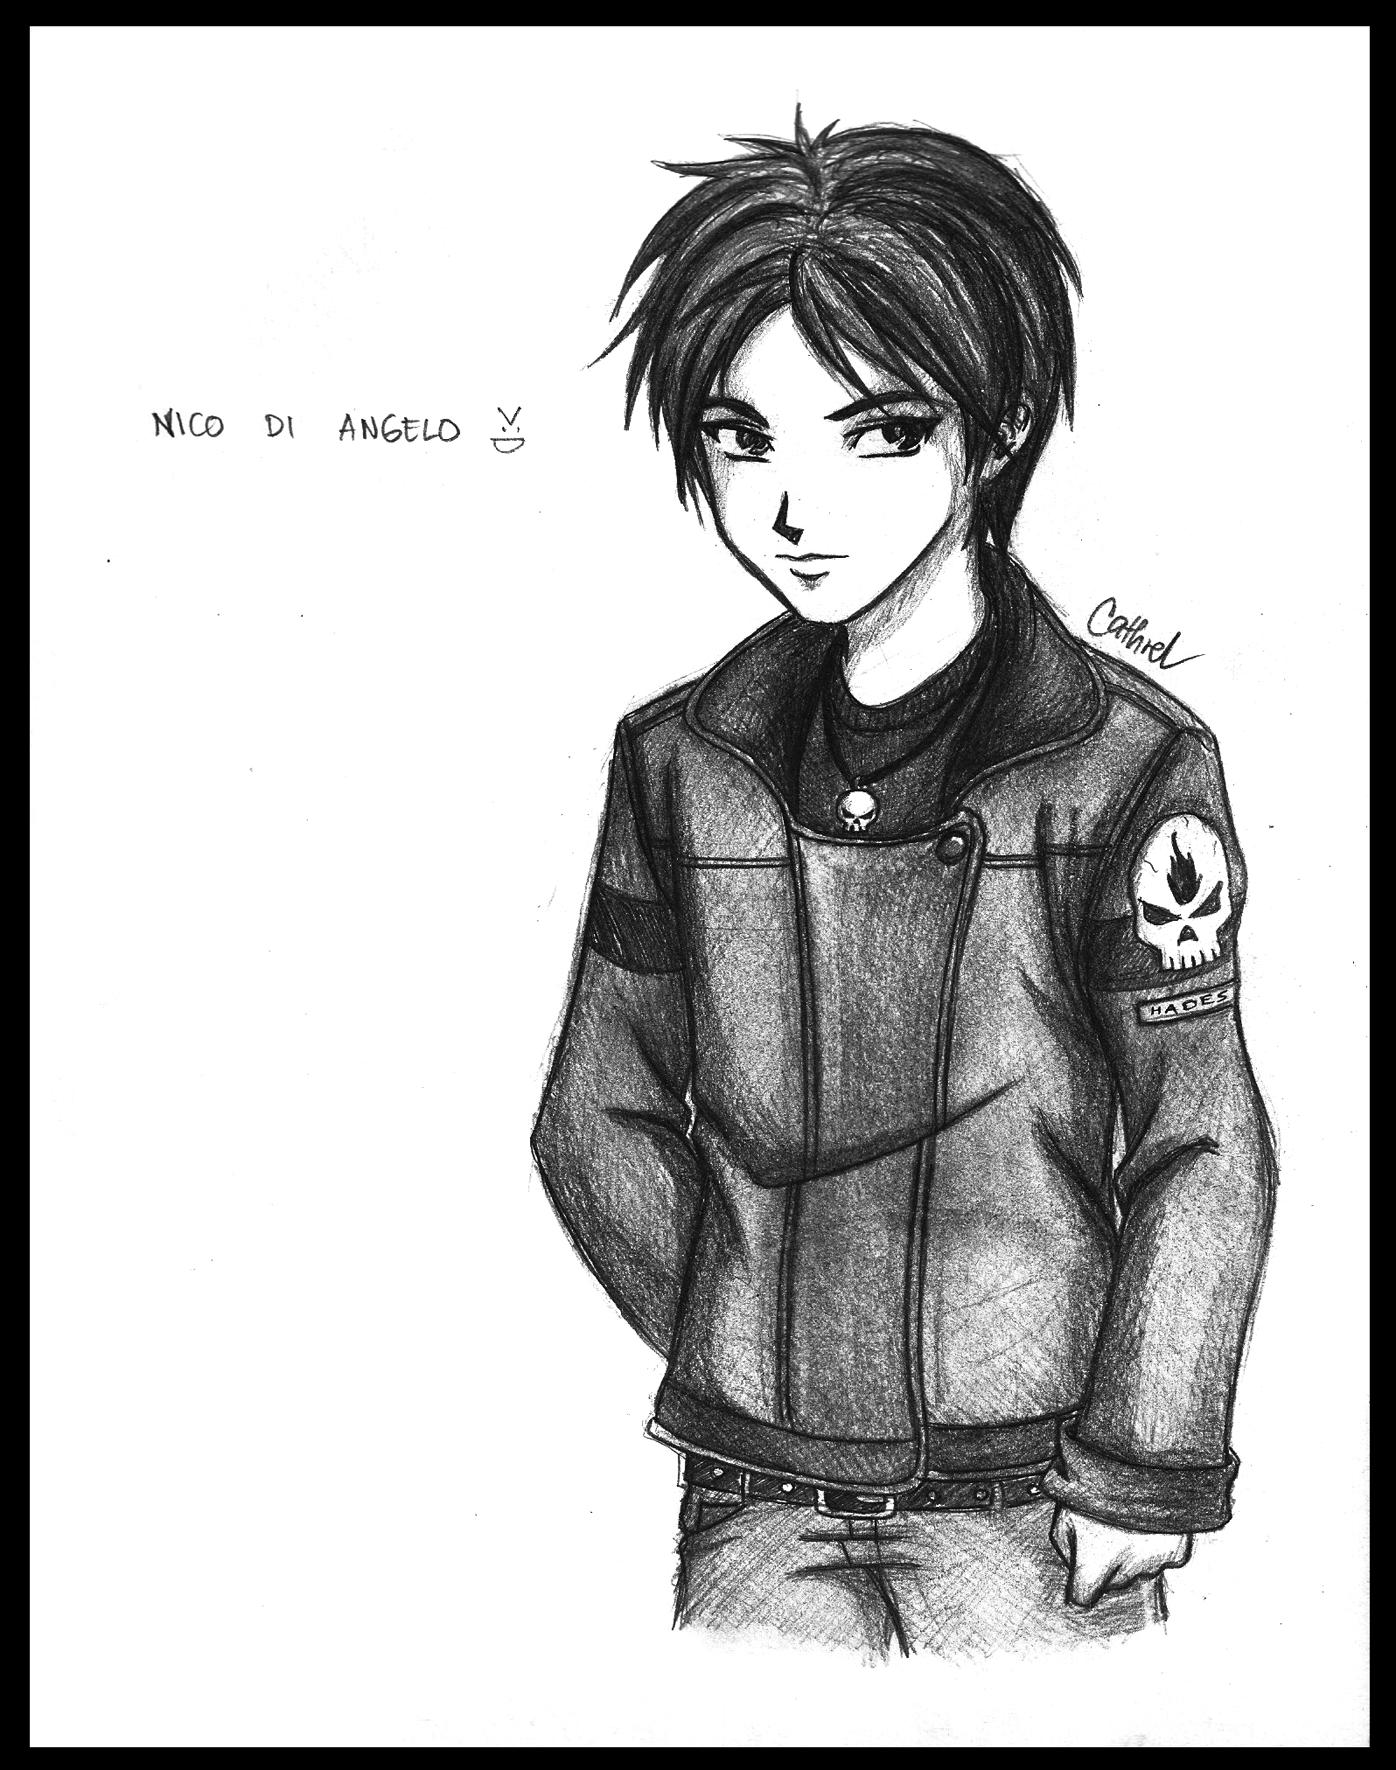 5c3a8cb32a30d59 aka NicoDeJenairo